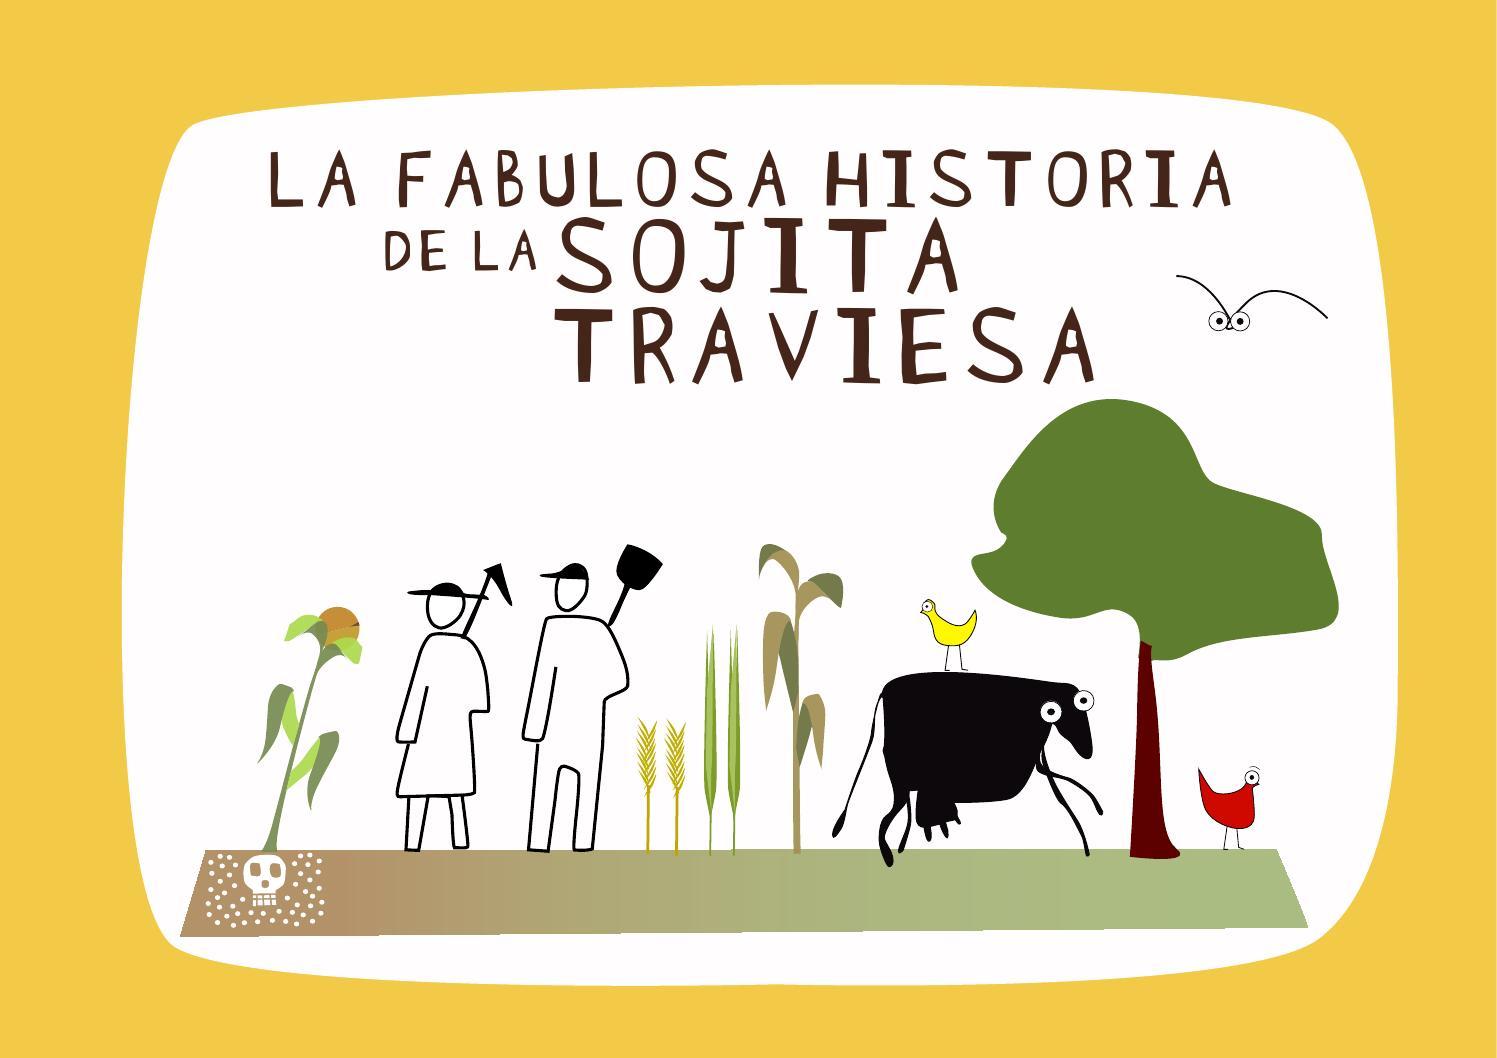 La fabulosa historia de la sojita traviesa corregido by Martín ...